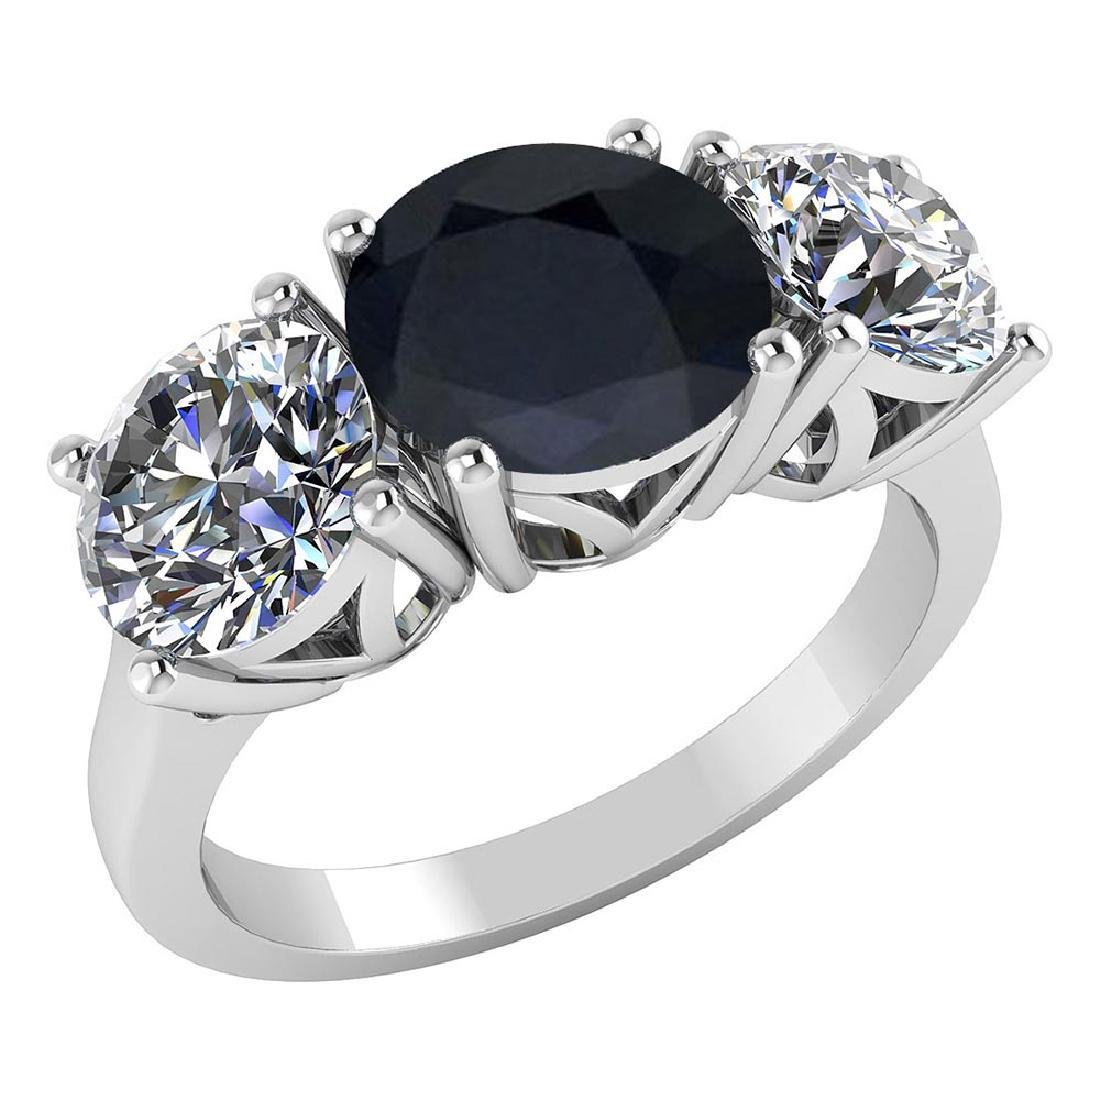 Certified 1.60 CTW Genuine Black Sapphire And Diamond 1